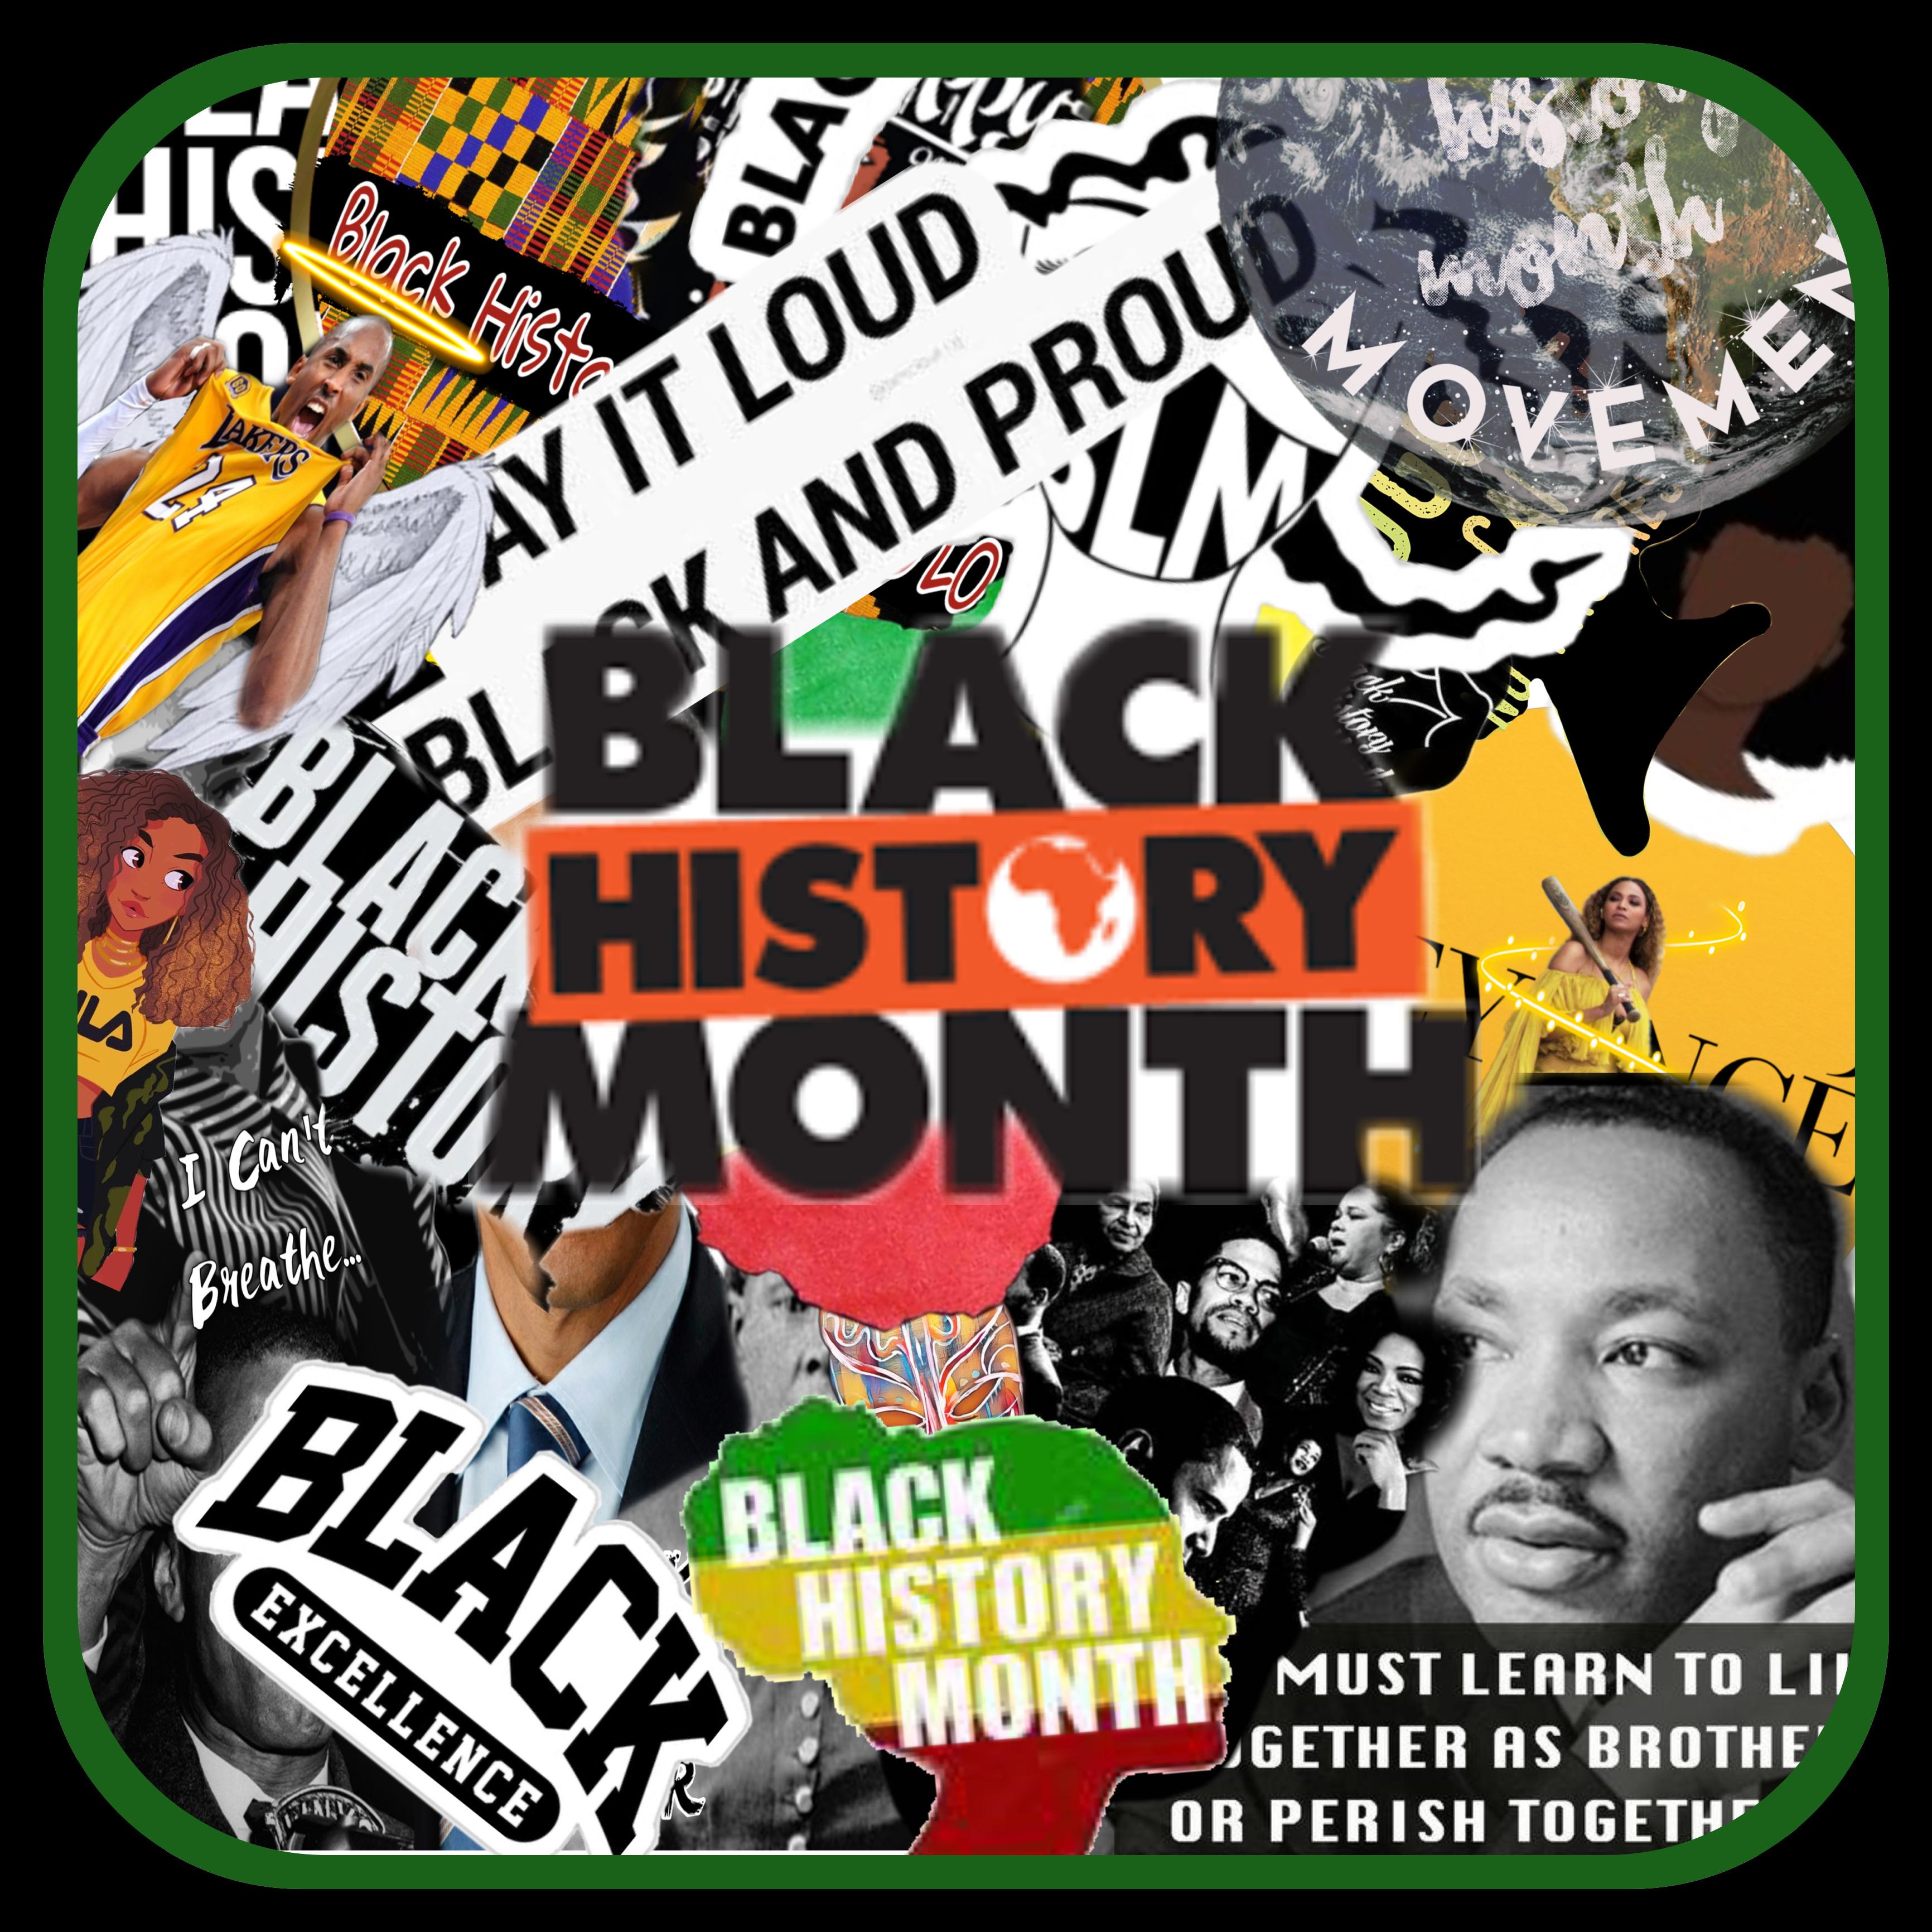 Black history month! #blm #kobe24 #blackandproud #blackhistorymonth #earth #wallpaper #blackhistorywallpaper